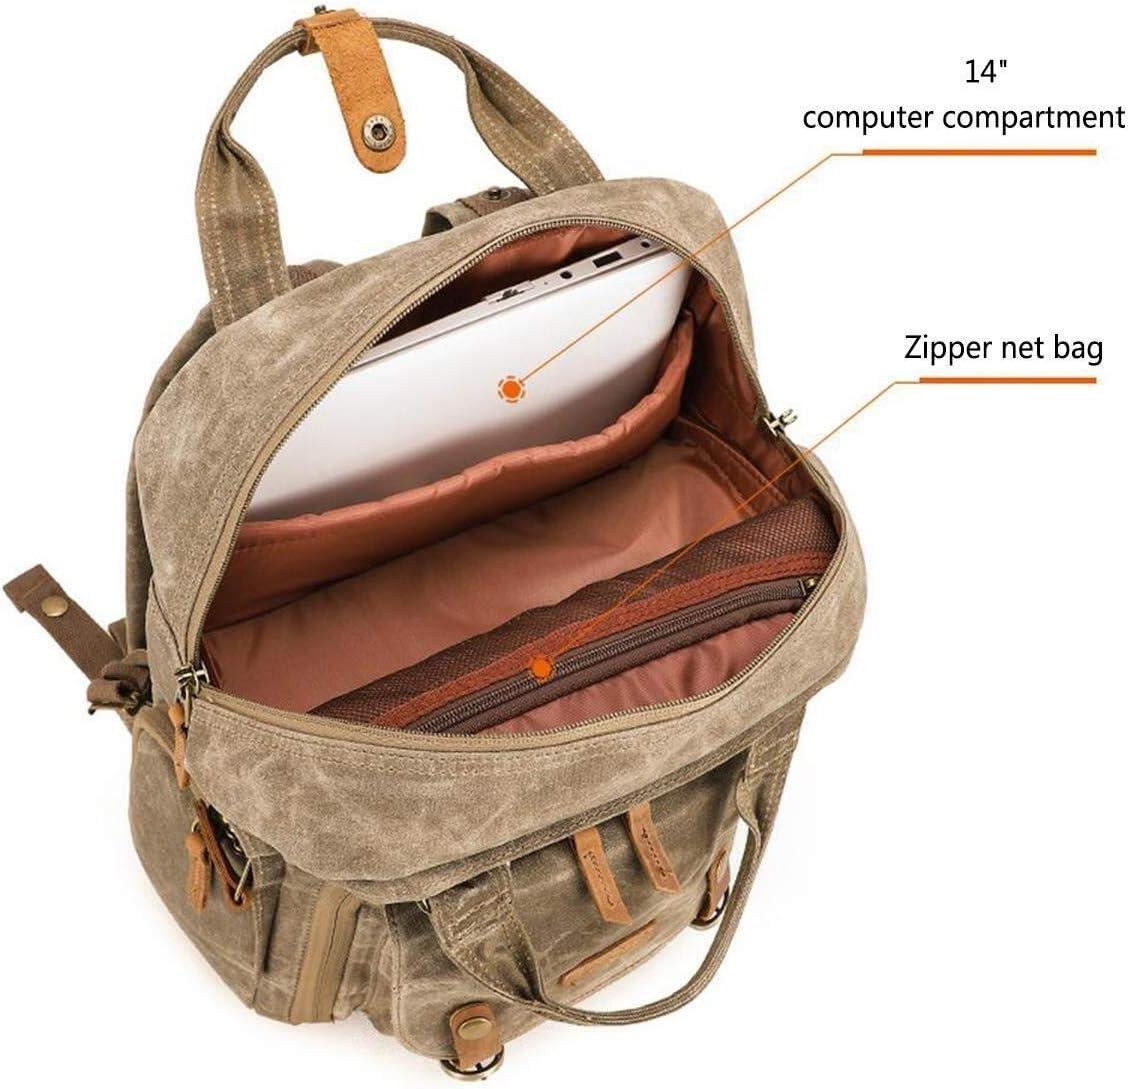 Photo Casual Travel Bag Camera Backpack Laptop Tripod and Accessories Multi-Function Backpack 30 X 16 X 42cm Versatile Zhengtufuzhuang Khaki Digital SLR Camera Backpack